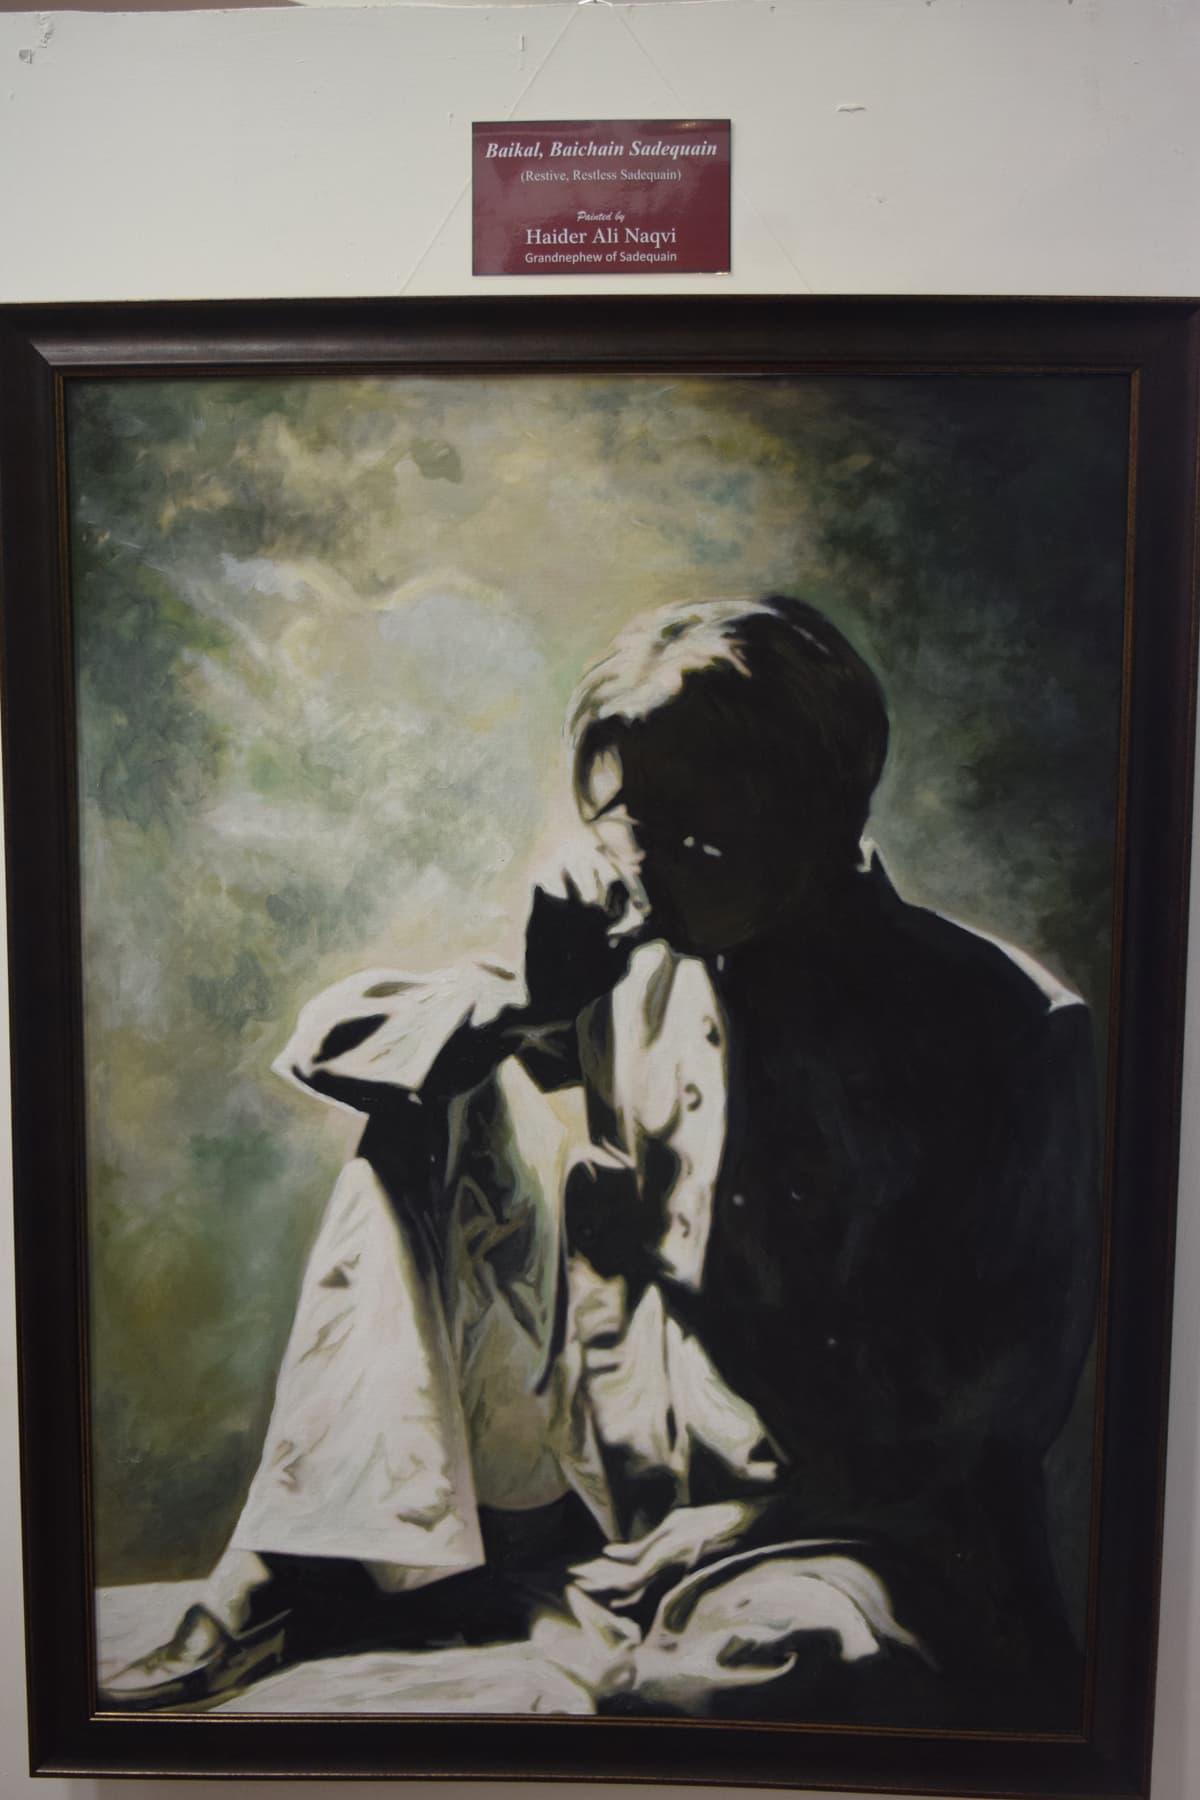 Sadequain's portrait as painted by his grandnephew. — Photo by Yumna Rafi